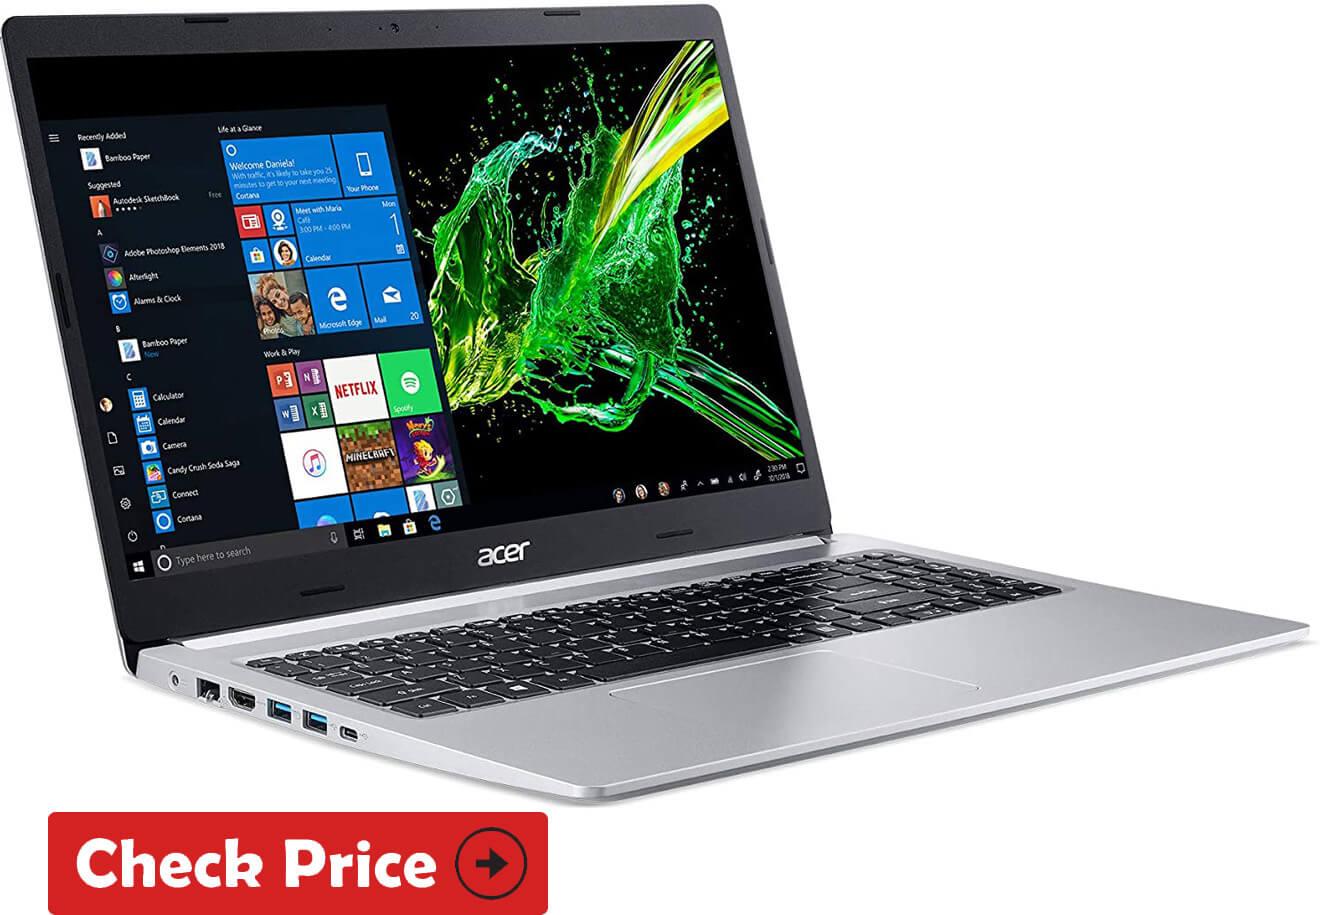 Acer Aspire 5 ssd laptop under 500 dollars